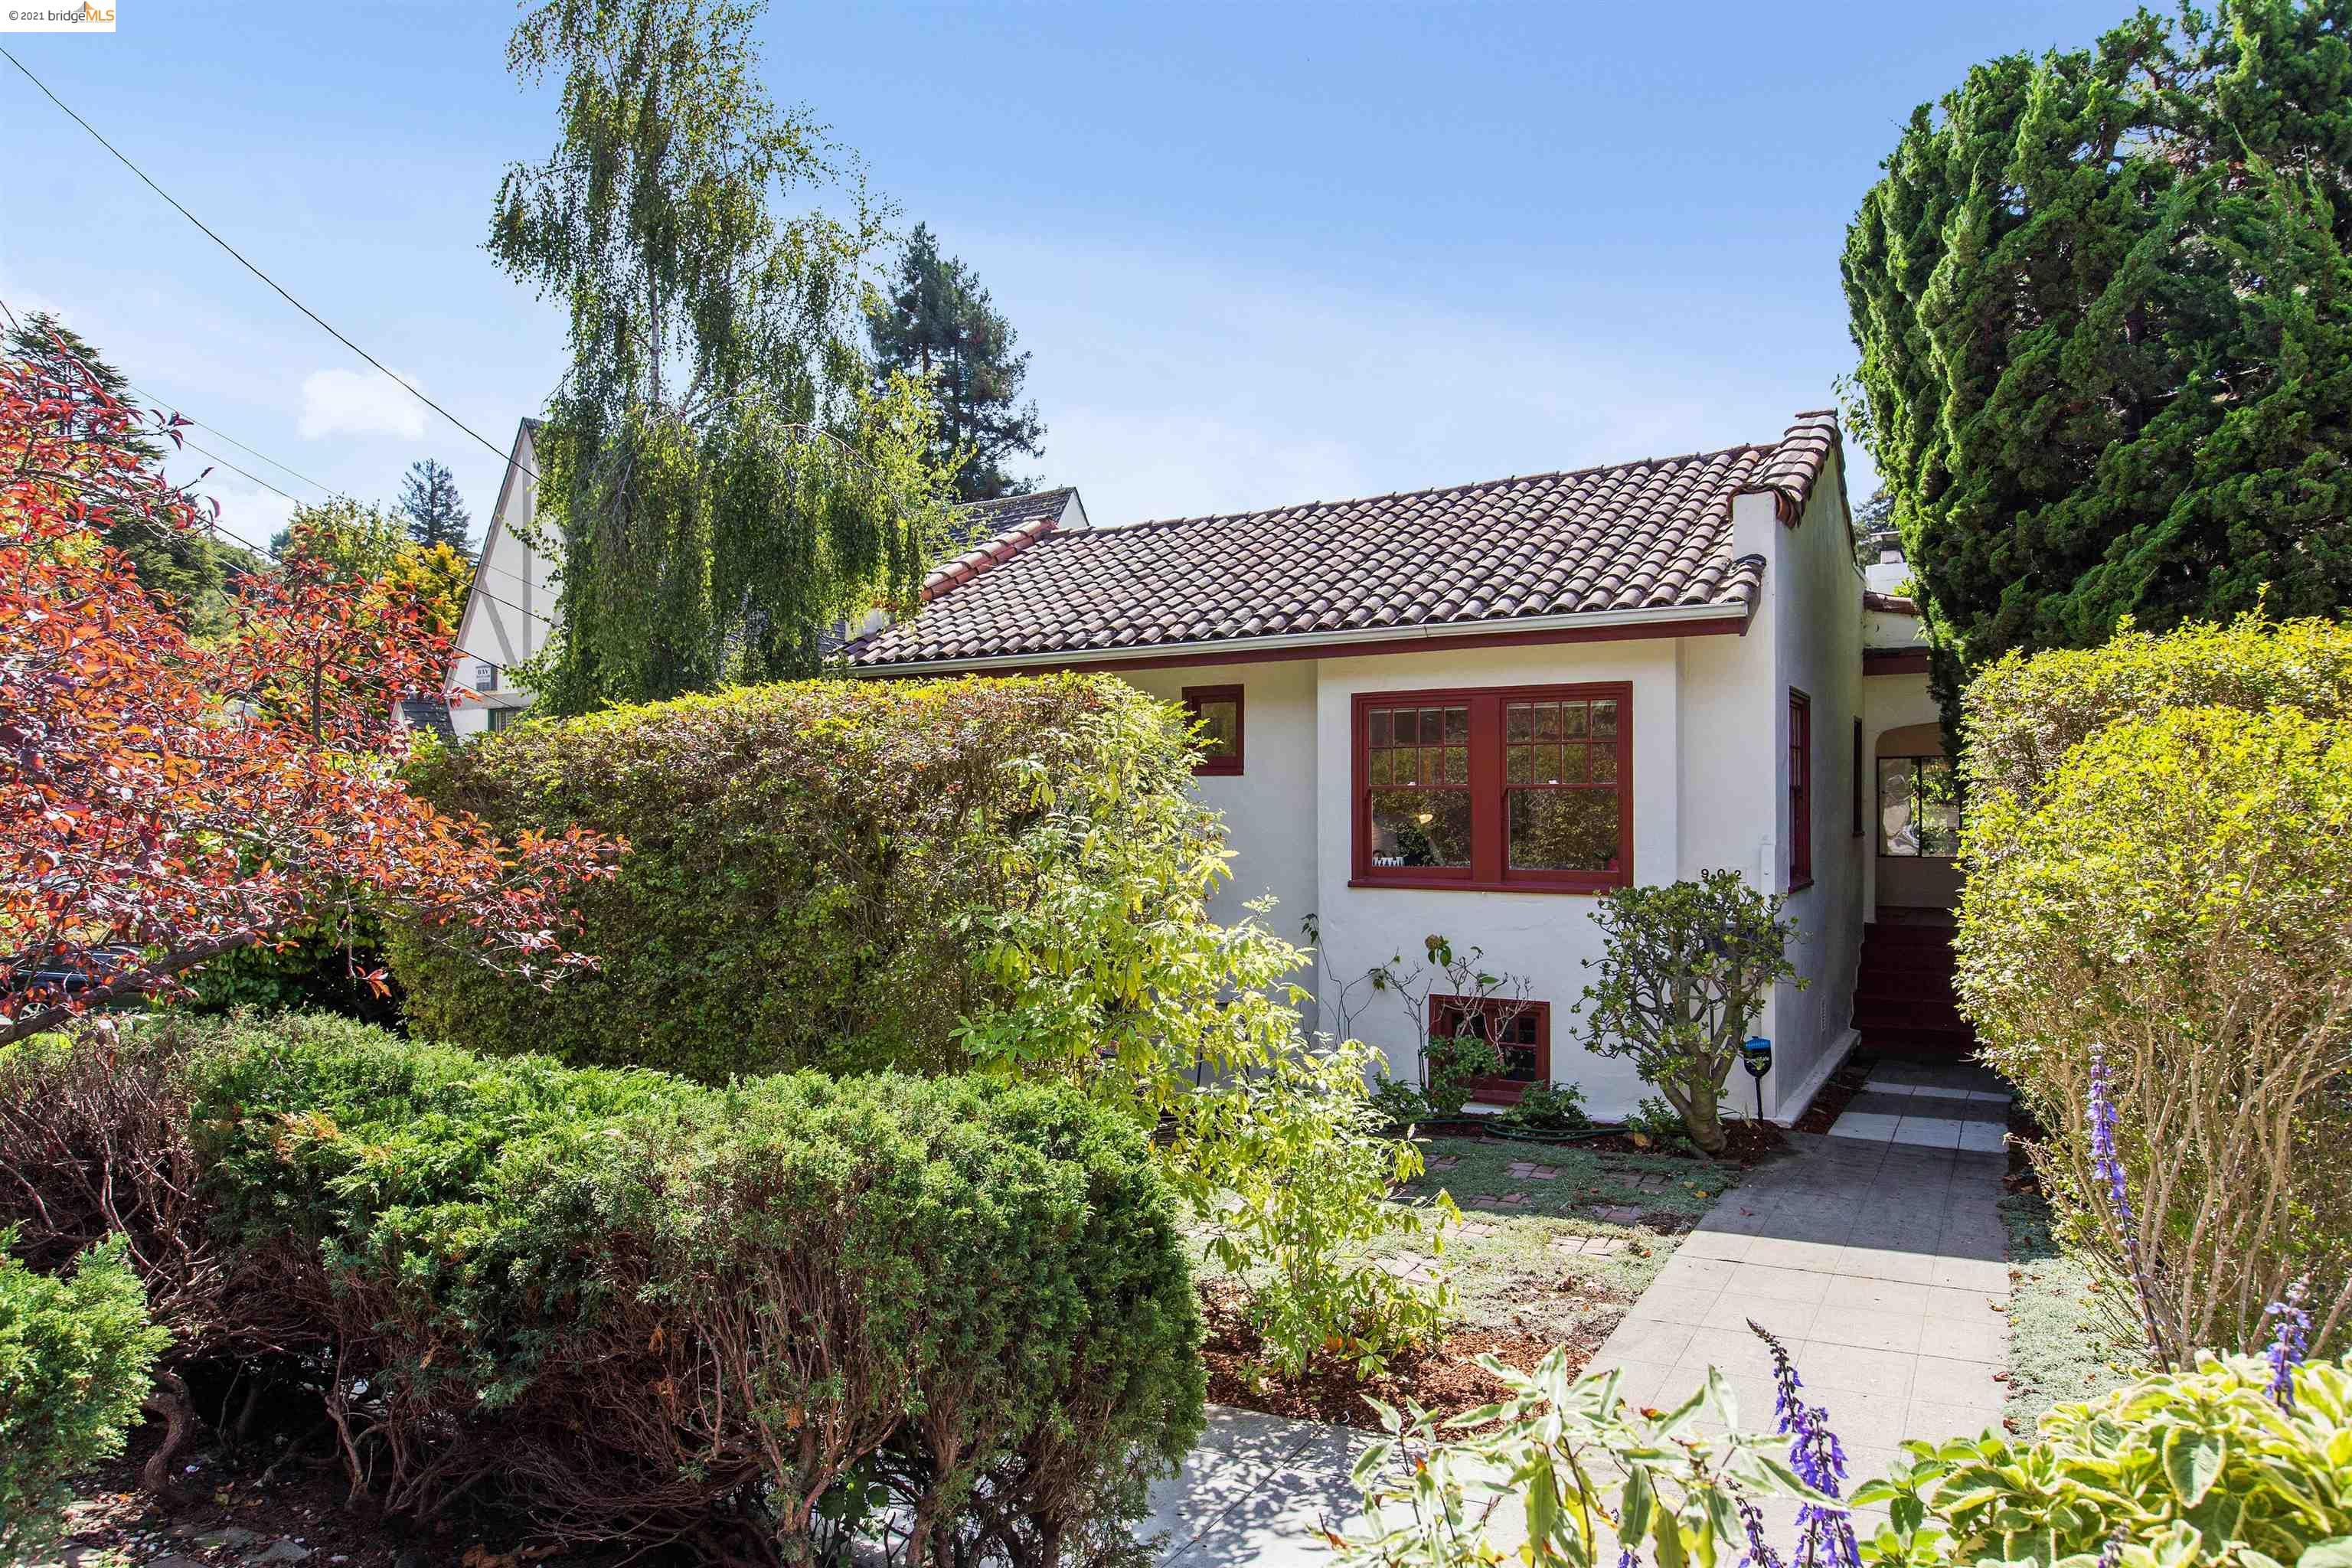 902 Euclid Ave, BERKELEY, CA 94708